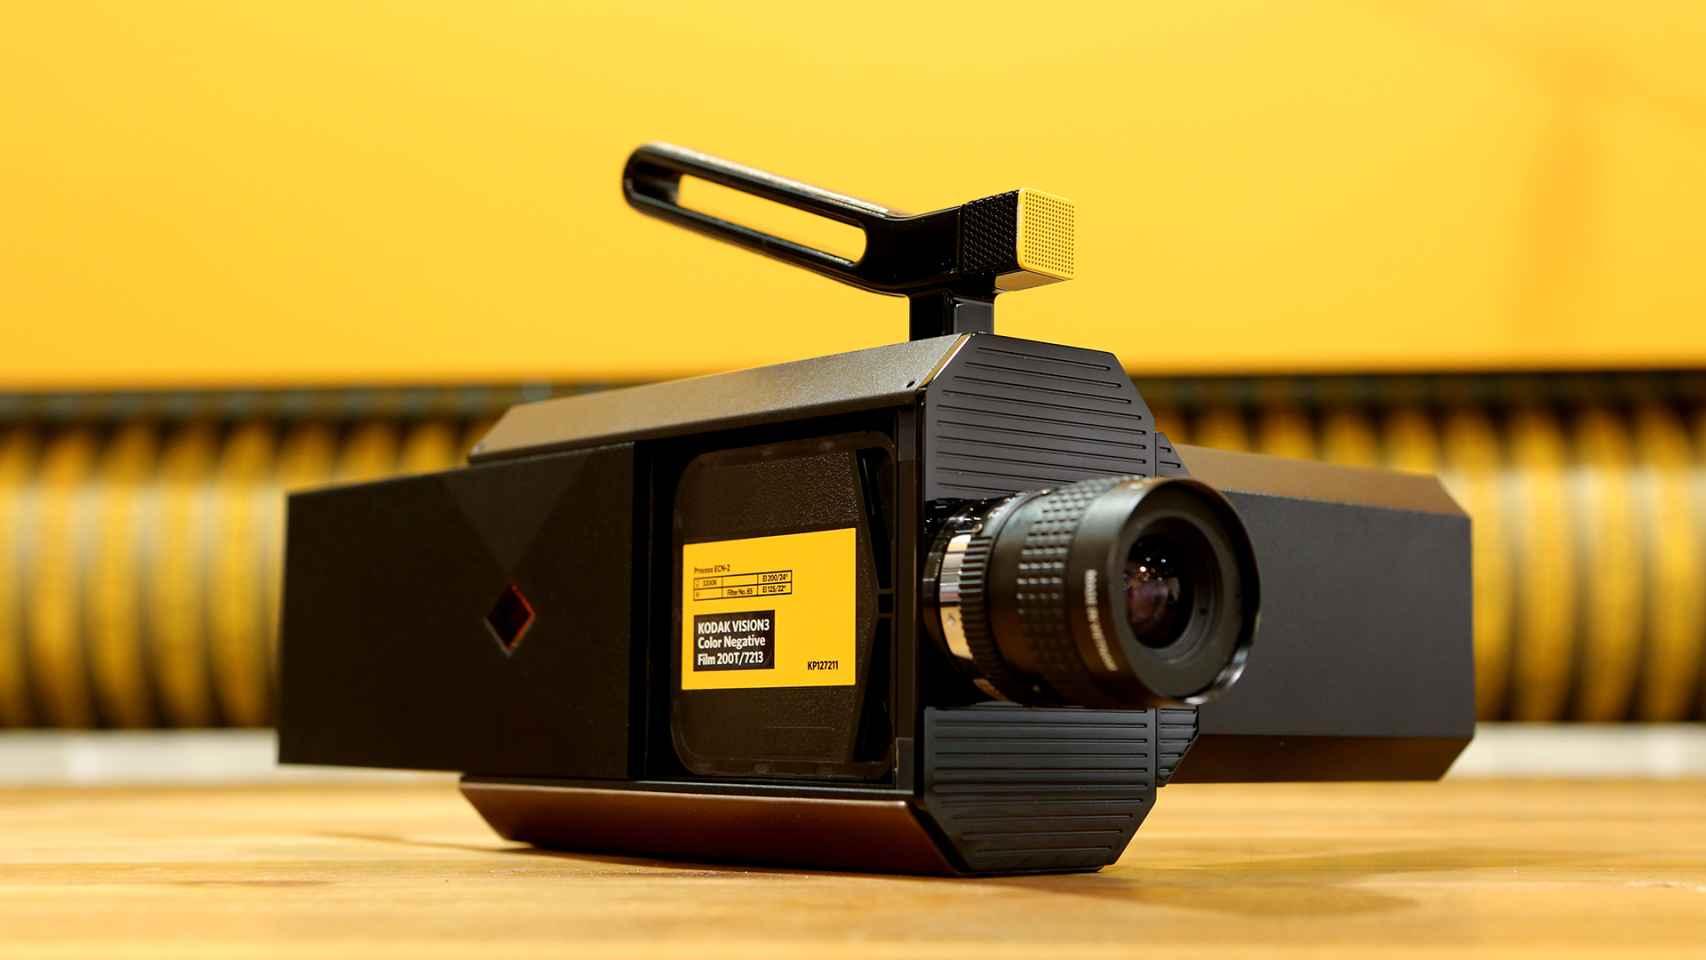 Imagen promocional de la nueva Kodak Super 8